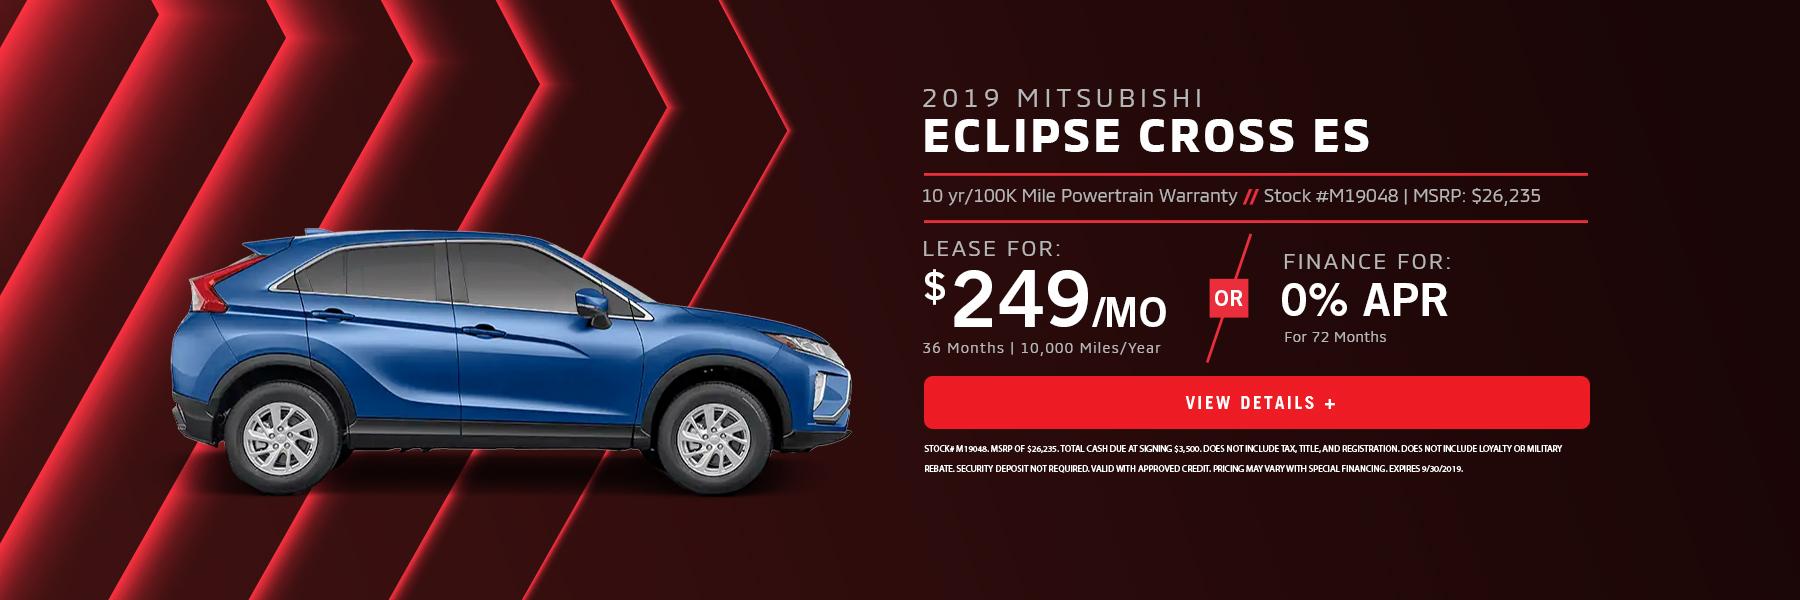 Eclipse Cross Lease or 0% APR Financing